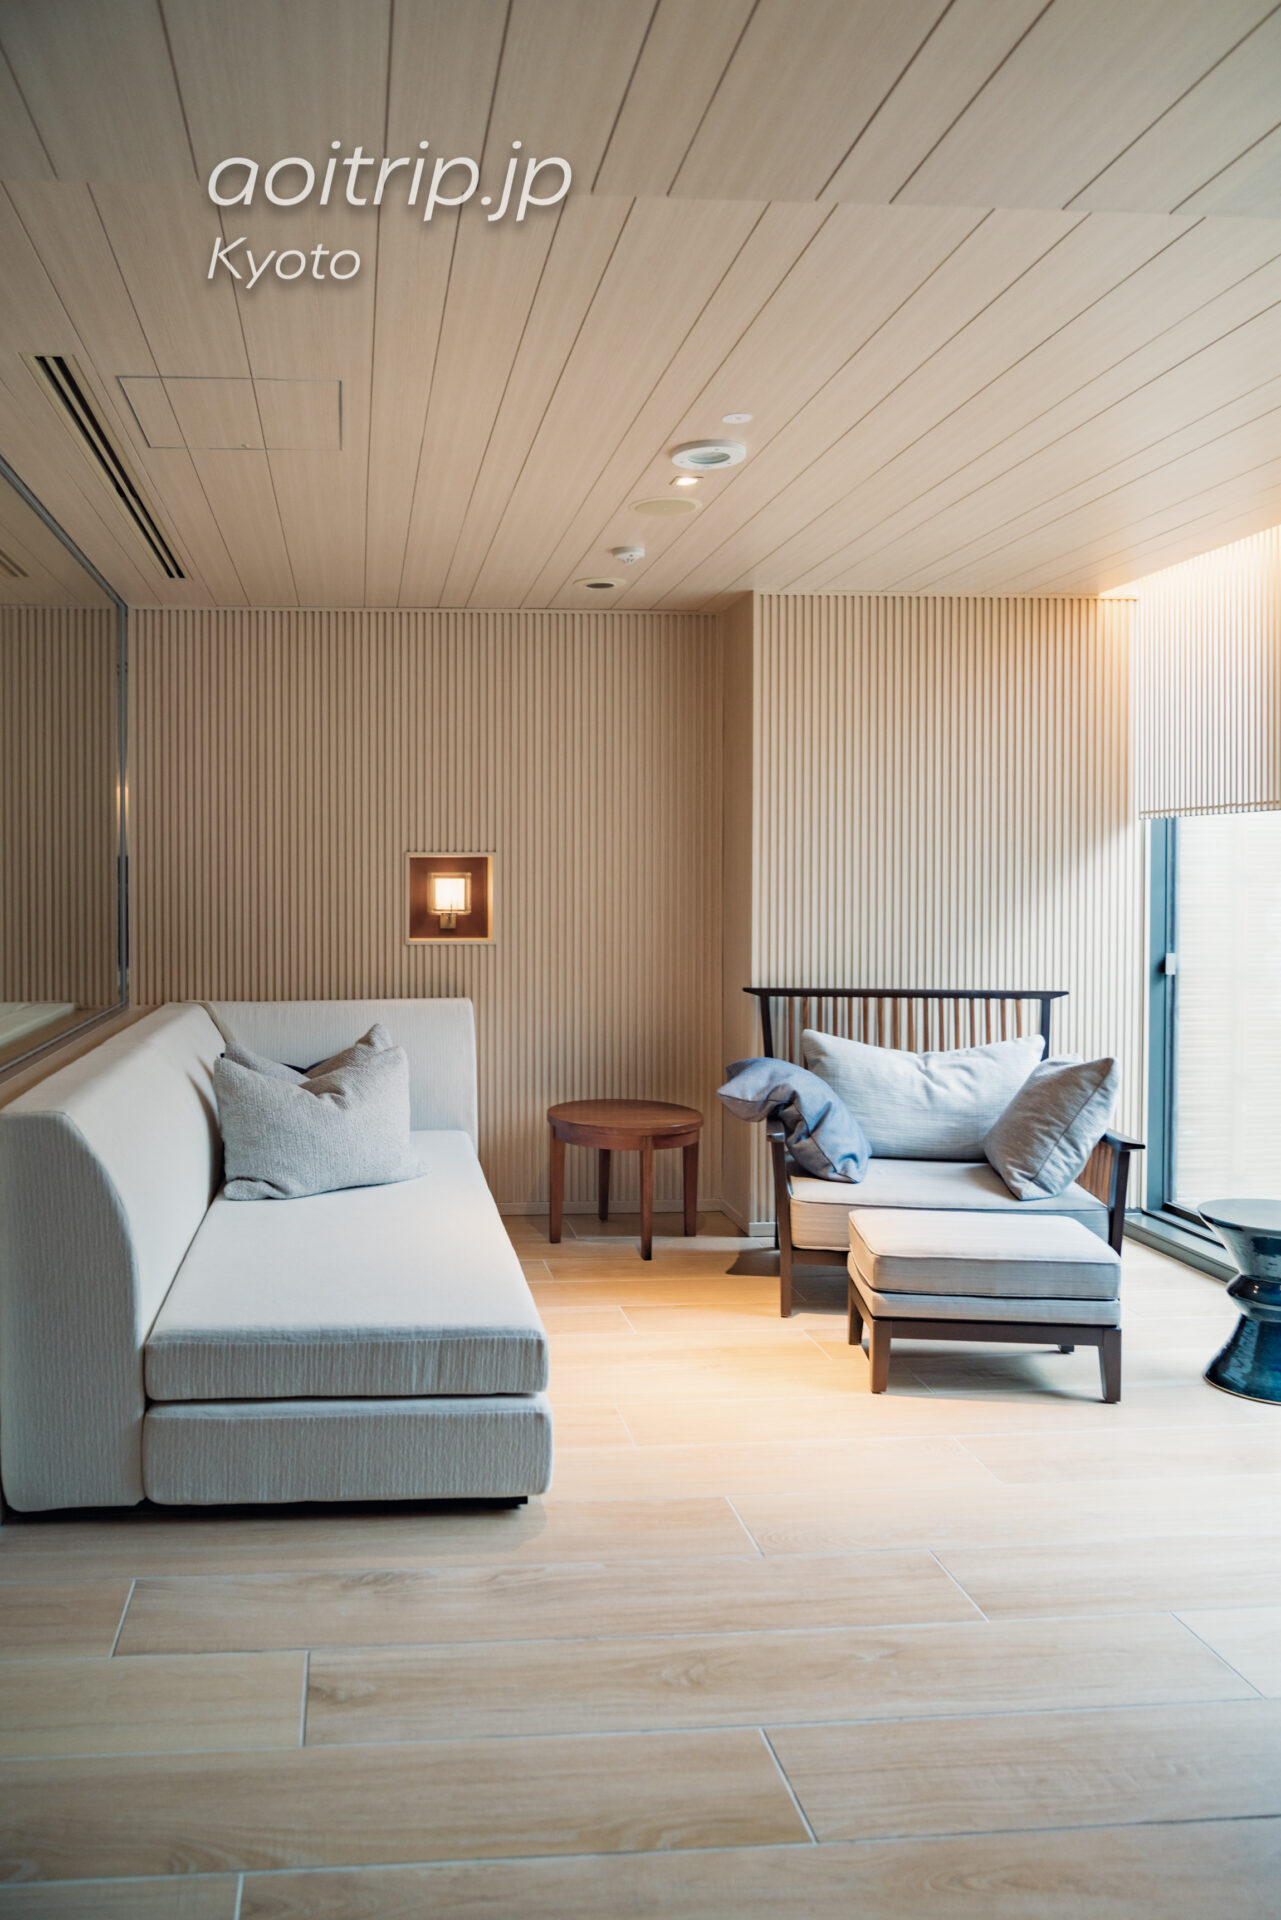 HOTEL THE MITSUI KYOTO プライベート温泉